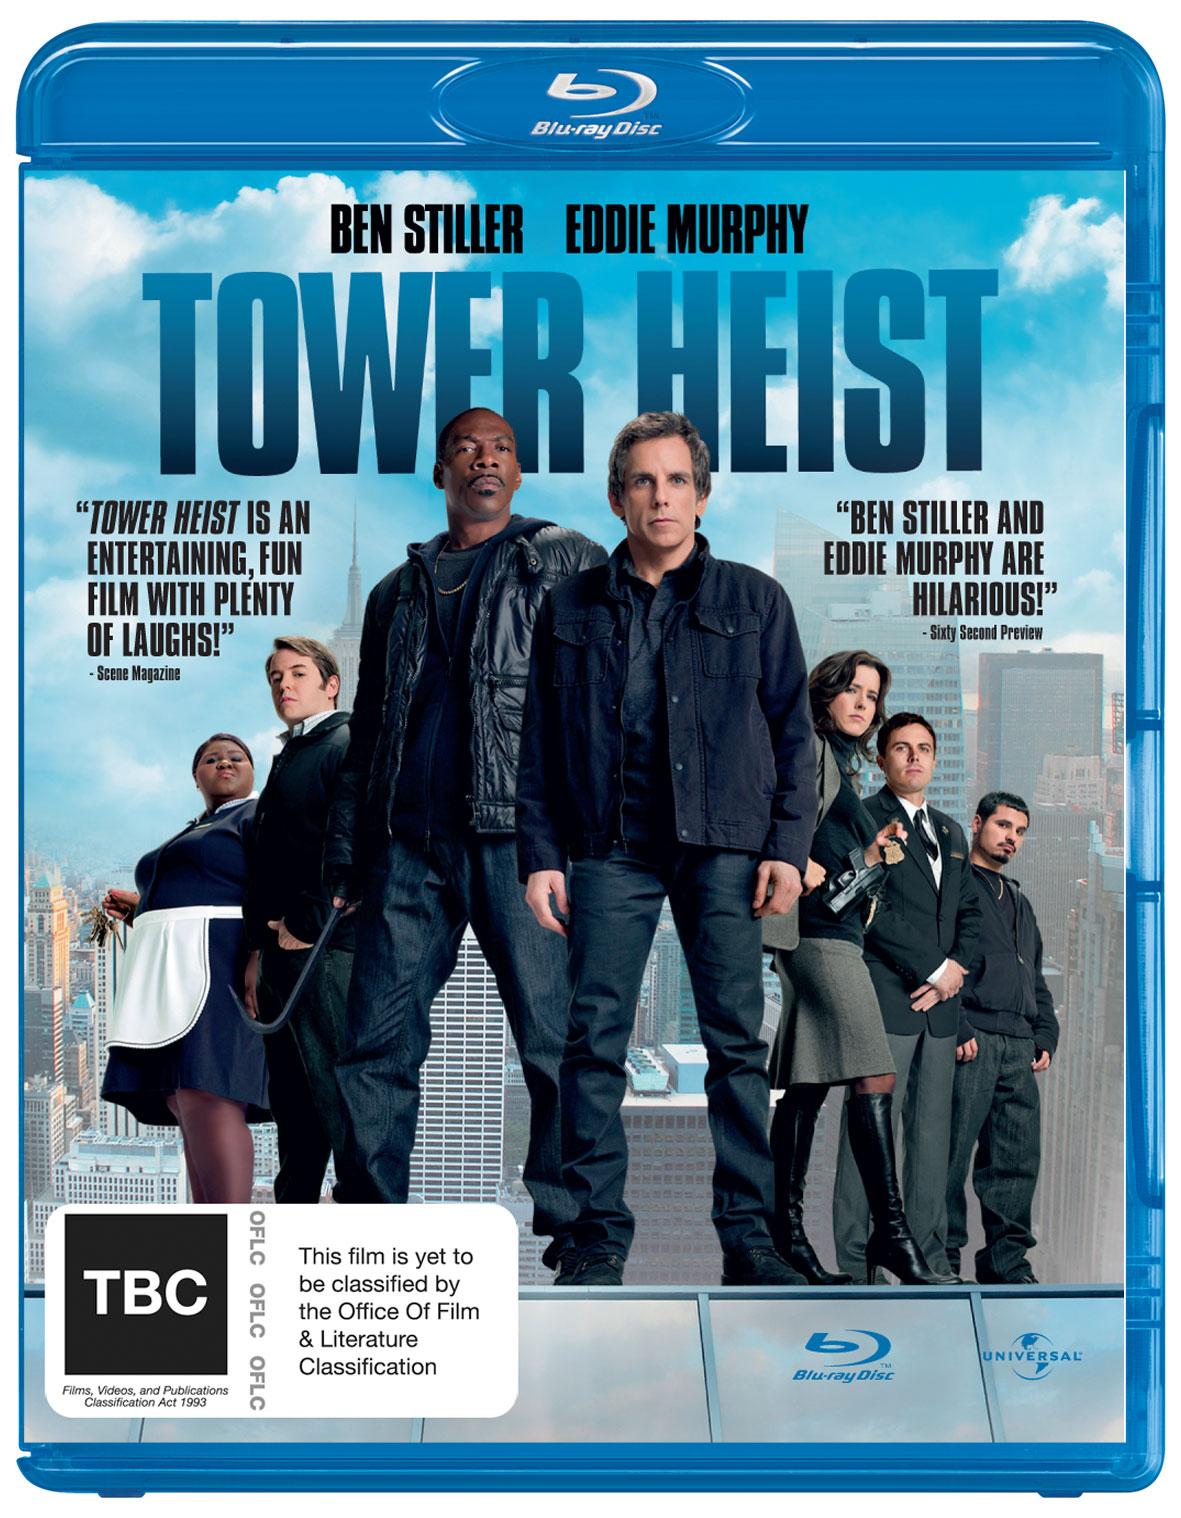 Tower Heist Movie